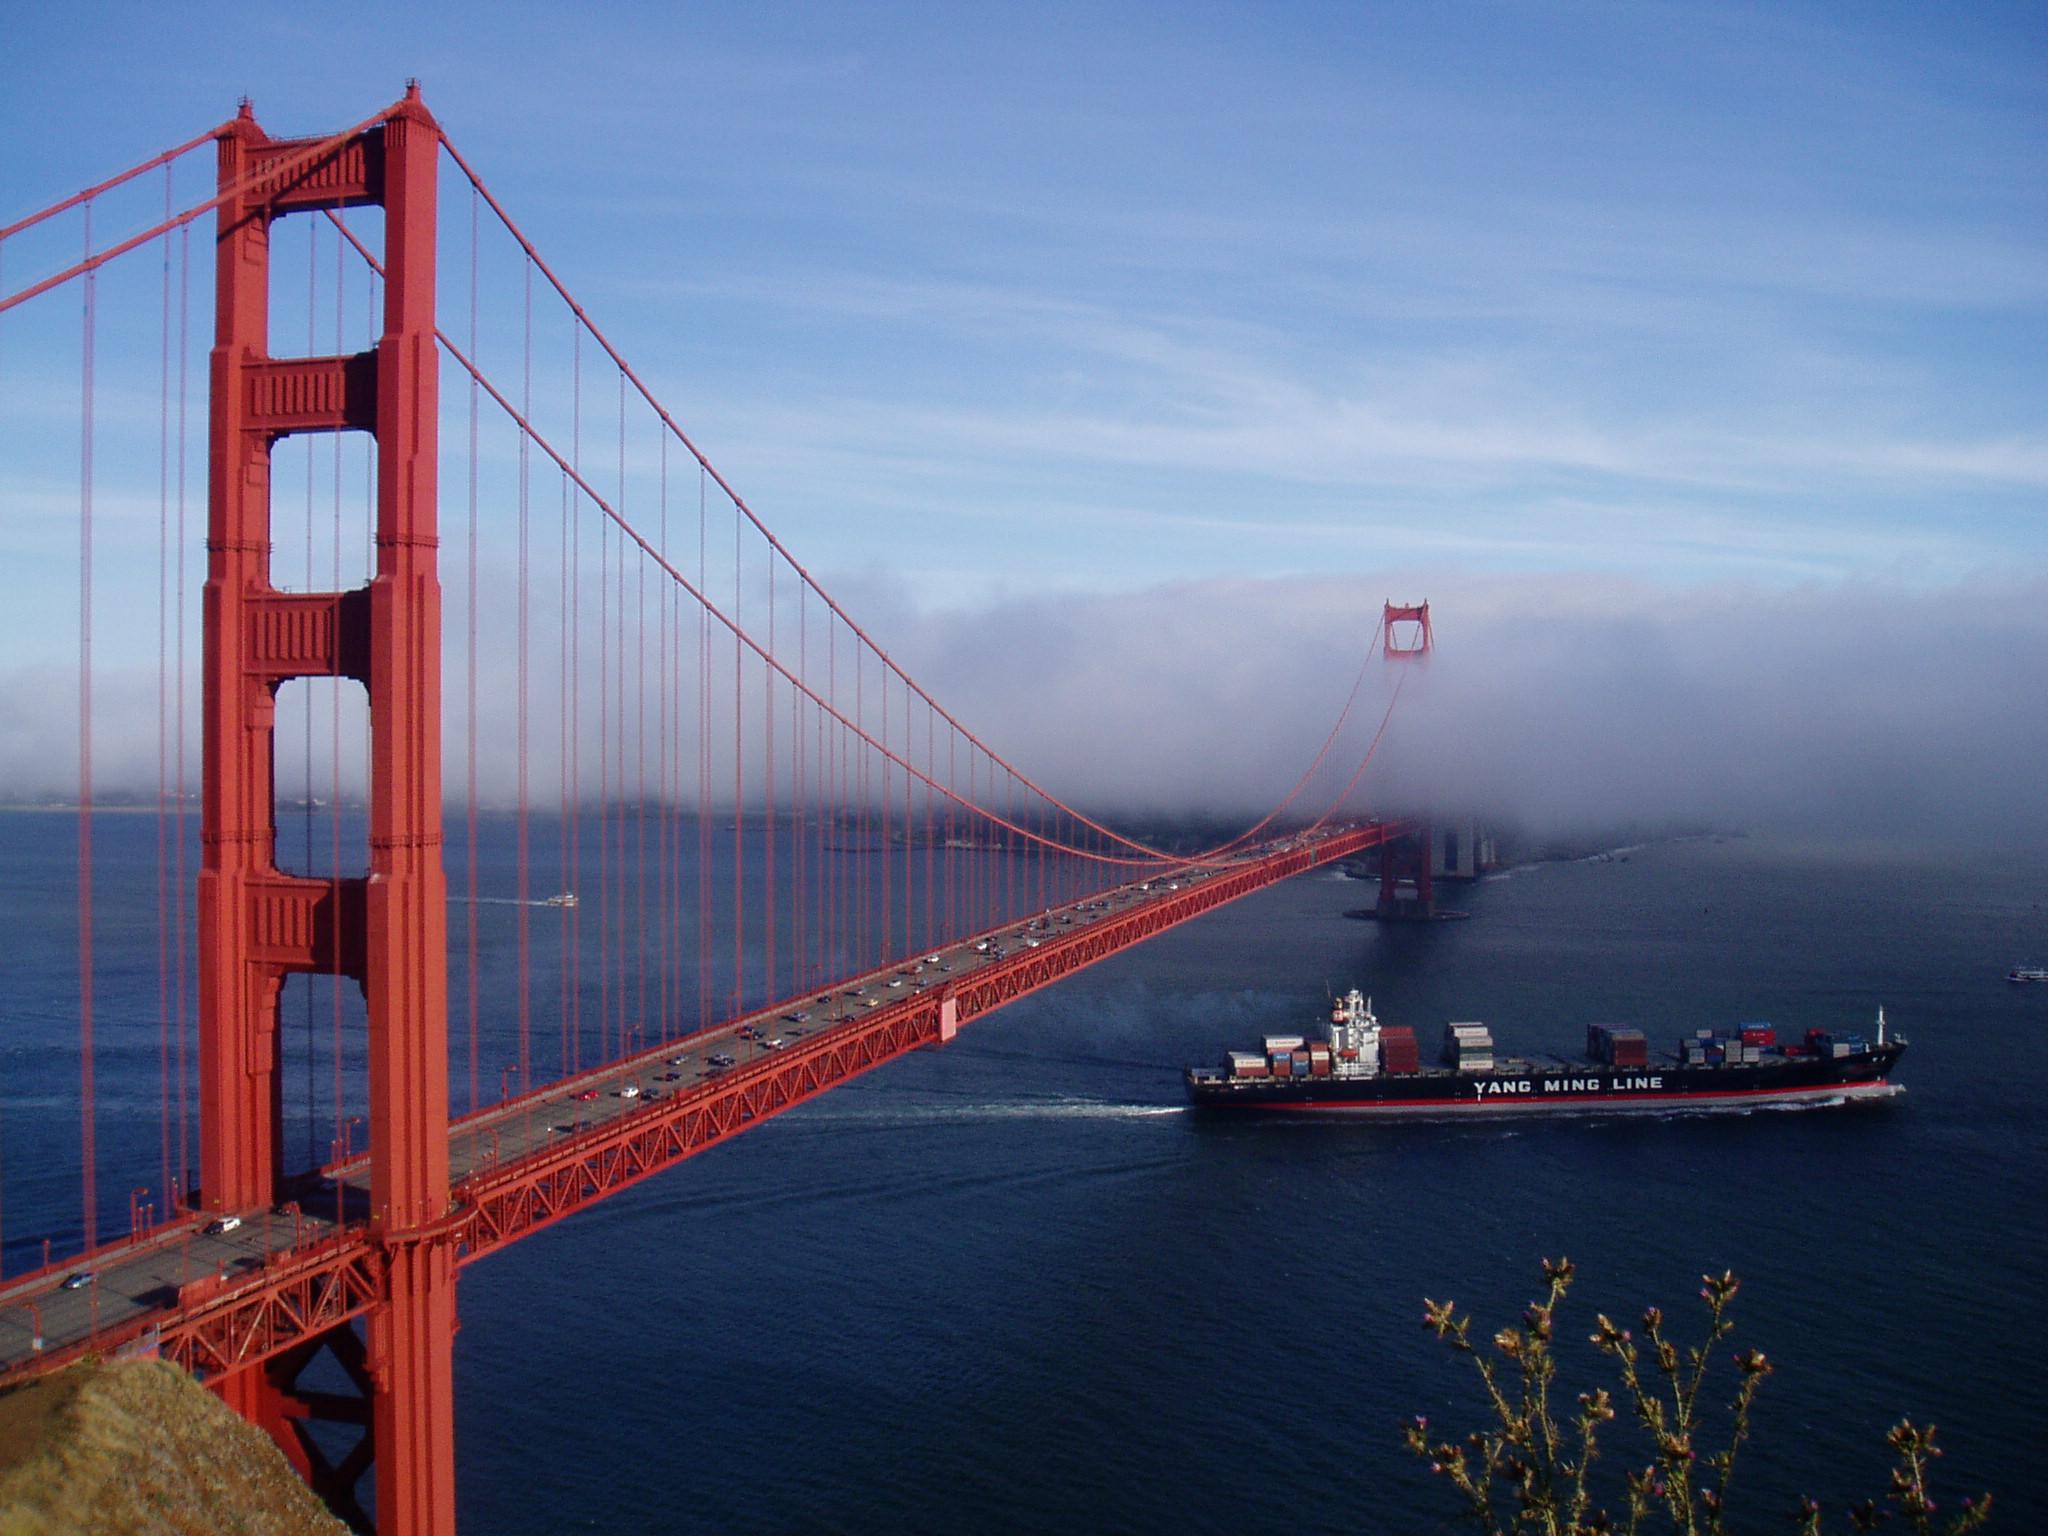 File:Golden Gate Bridge Yang Ming Line.jpg